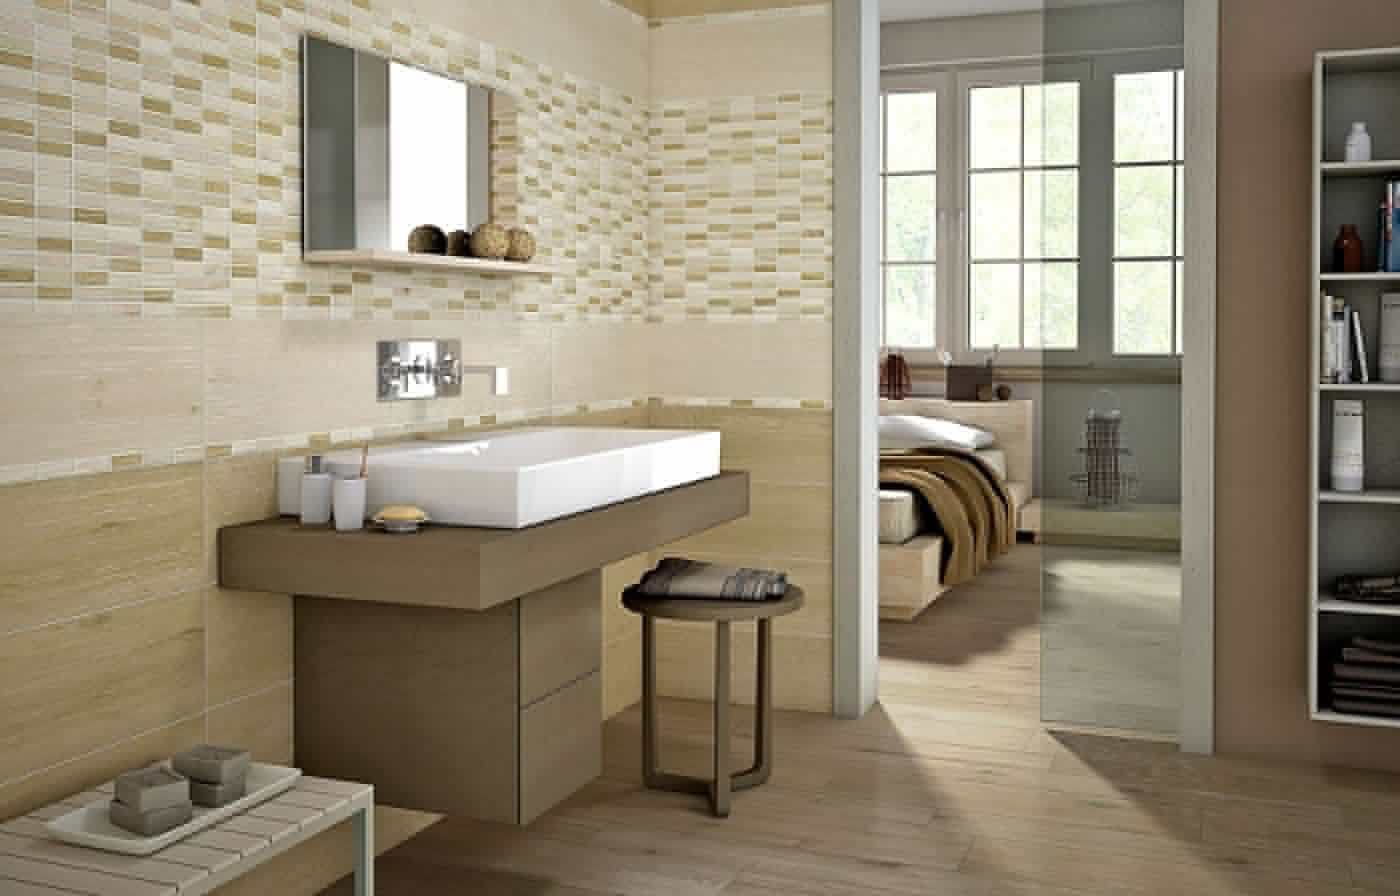 Flaviker #wood wall beige 20x60 cm ww2630 #gres #legno #20x60 su